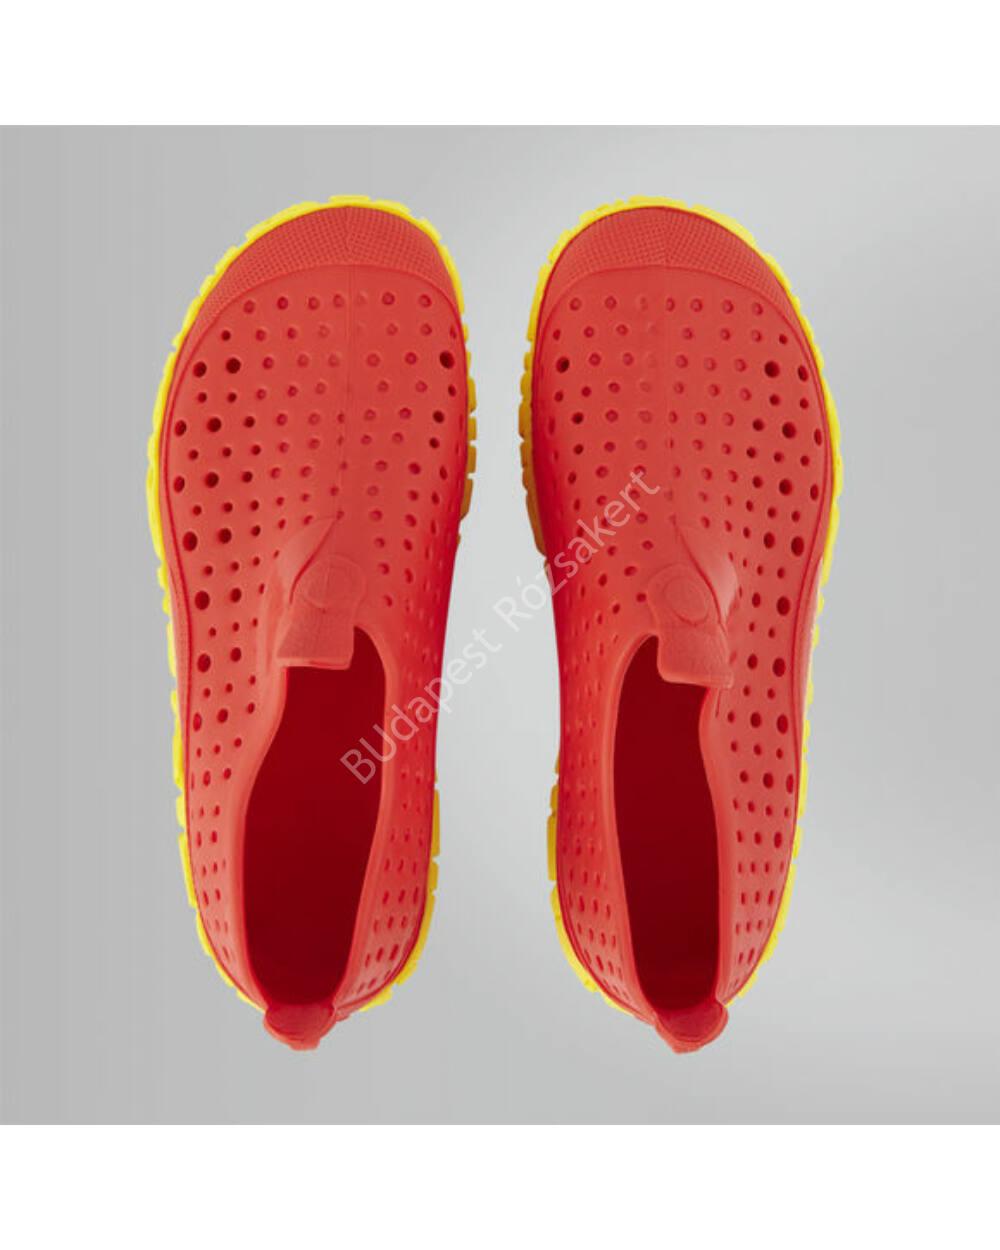 Speedo Jelly Junior gyerek vizicipő piros-sárga 34,5